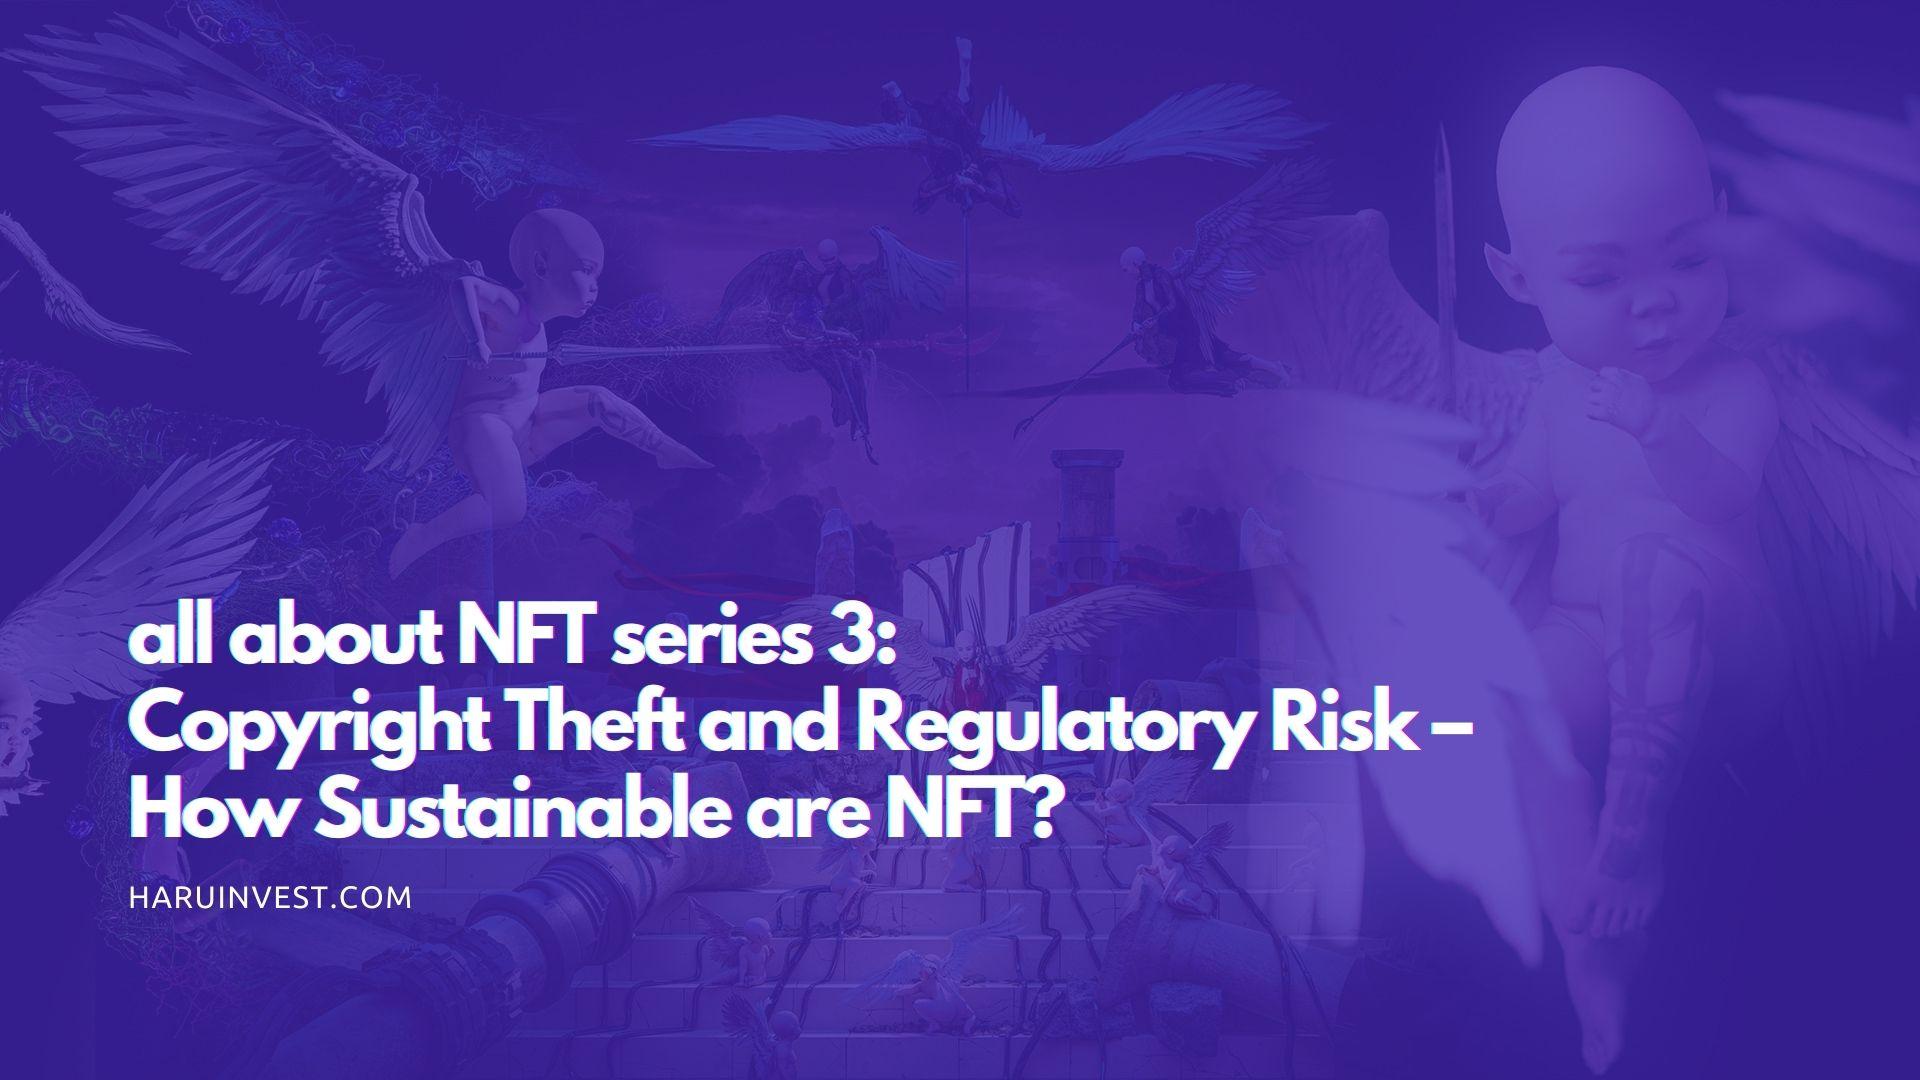 nft copyright theft and regulatory risk